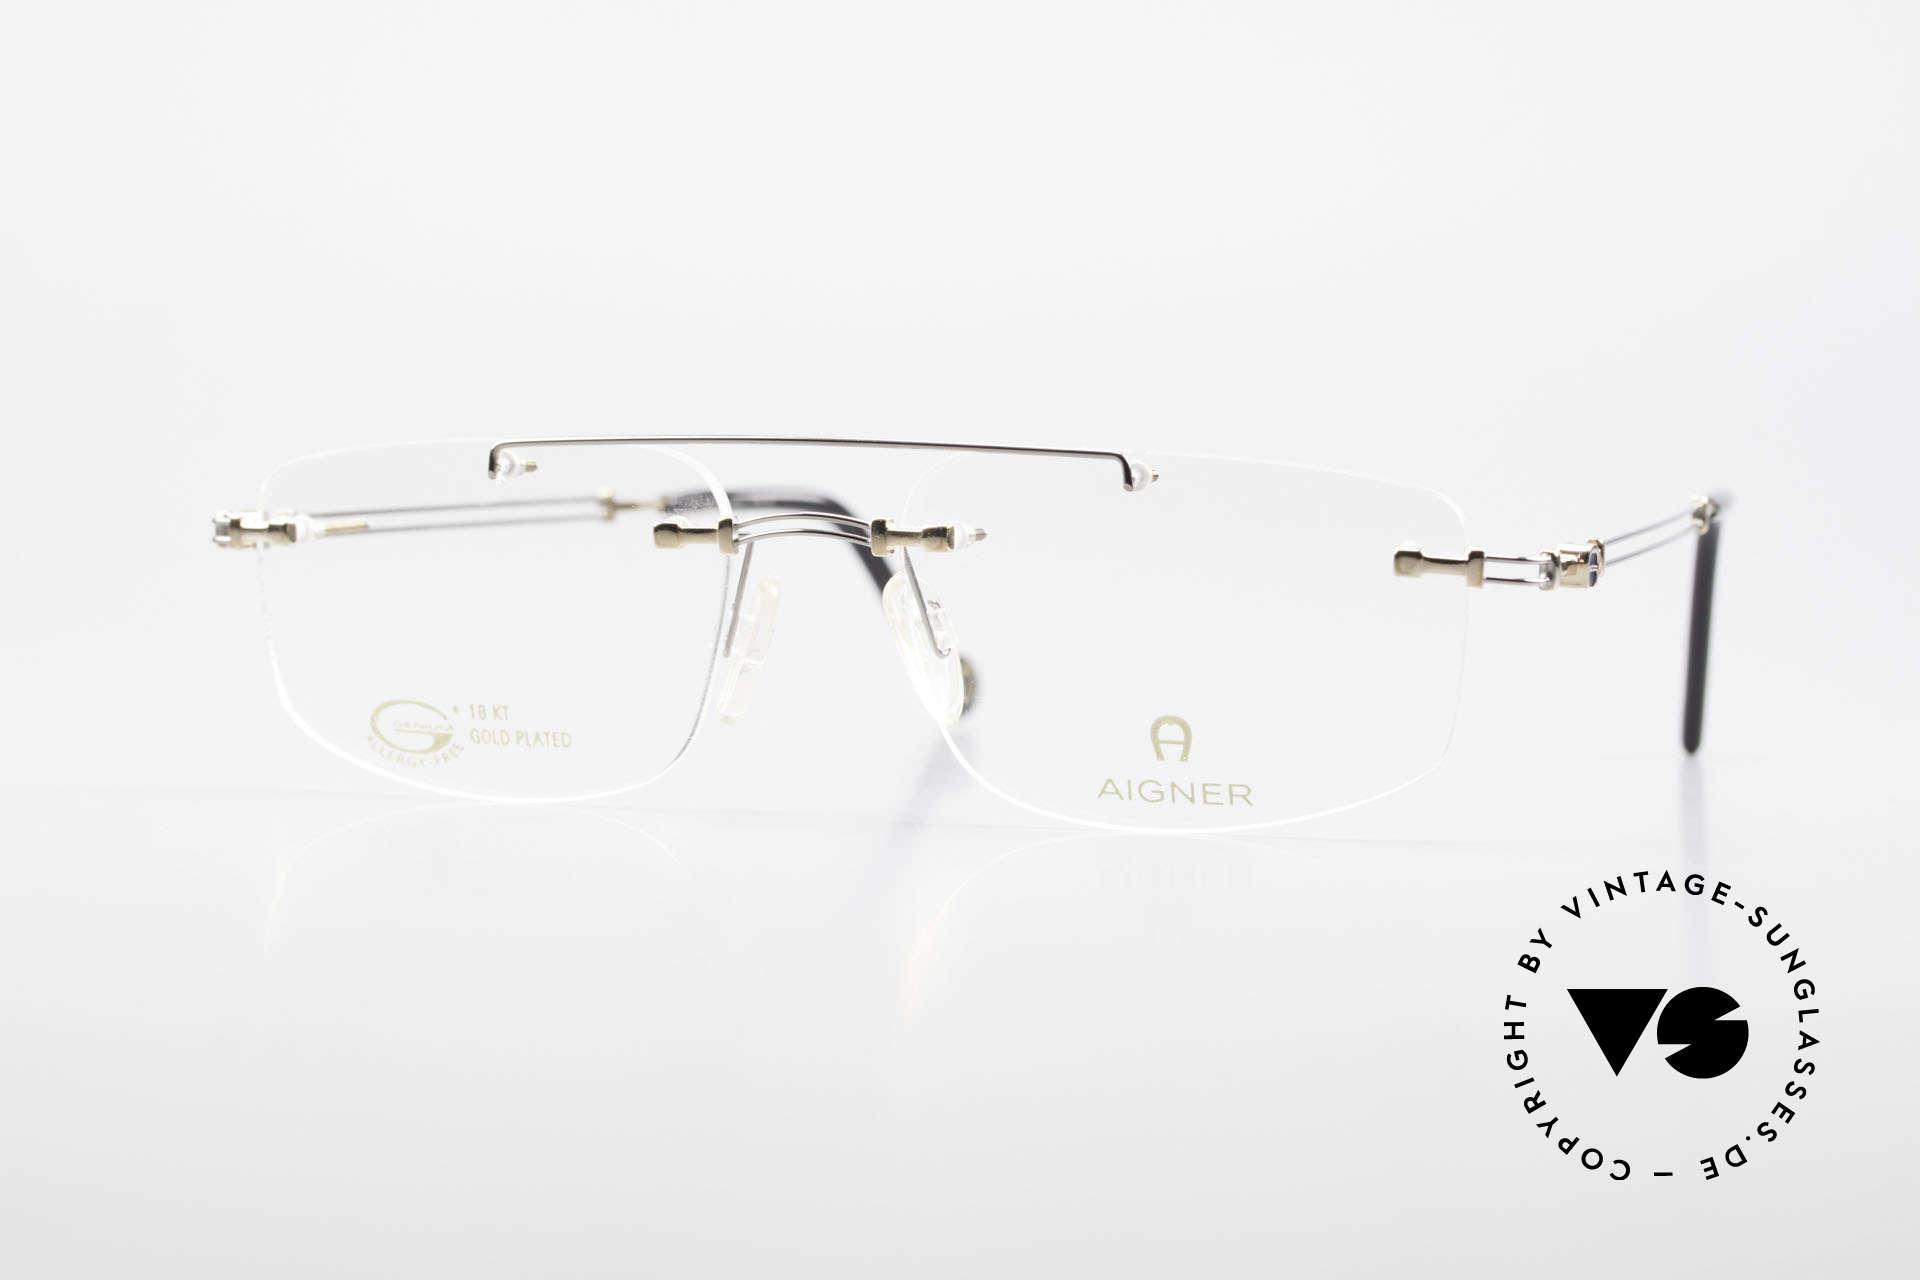 Aigner EA499 Randlose Vintage Brille Herren, randlose Aigner VINTAGE Brille, EA499, Gr. 54/18, 140, Passend für Herren